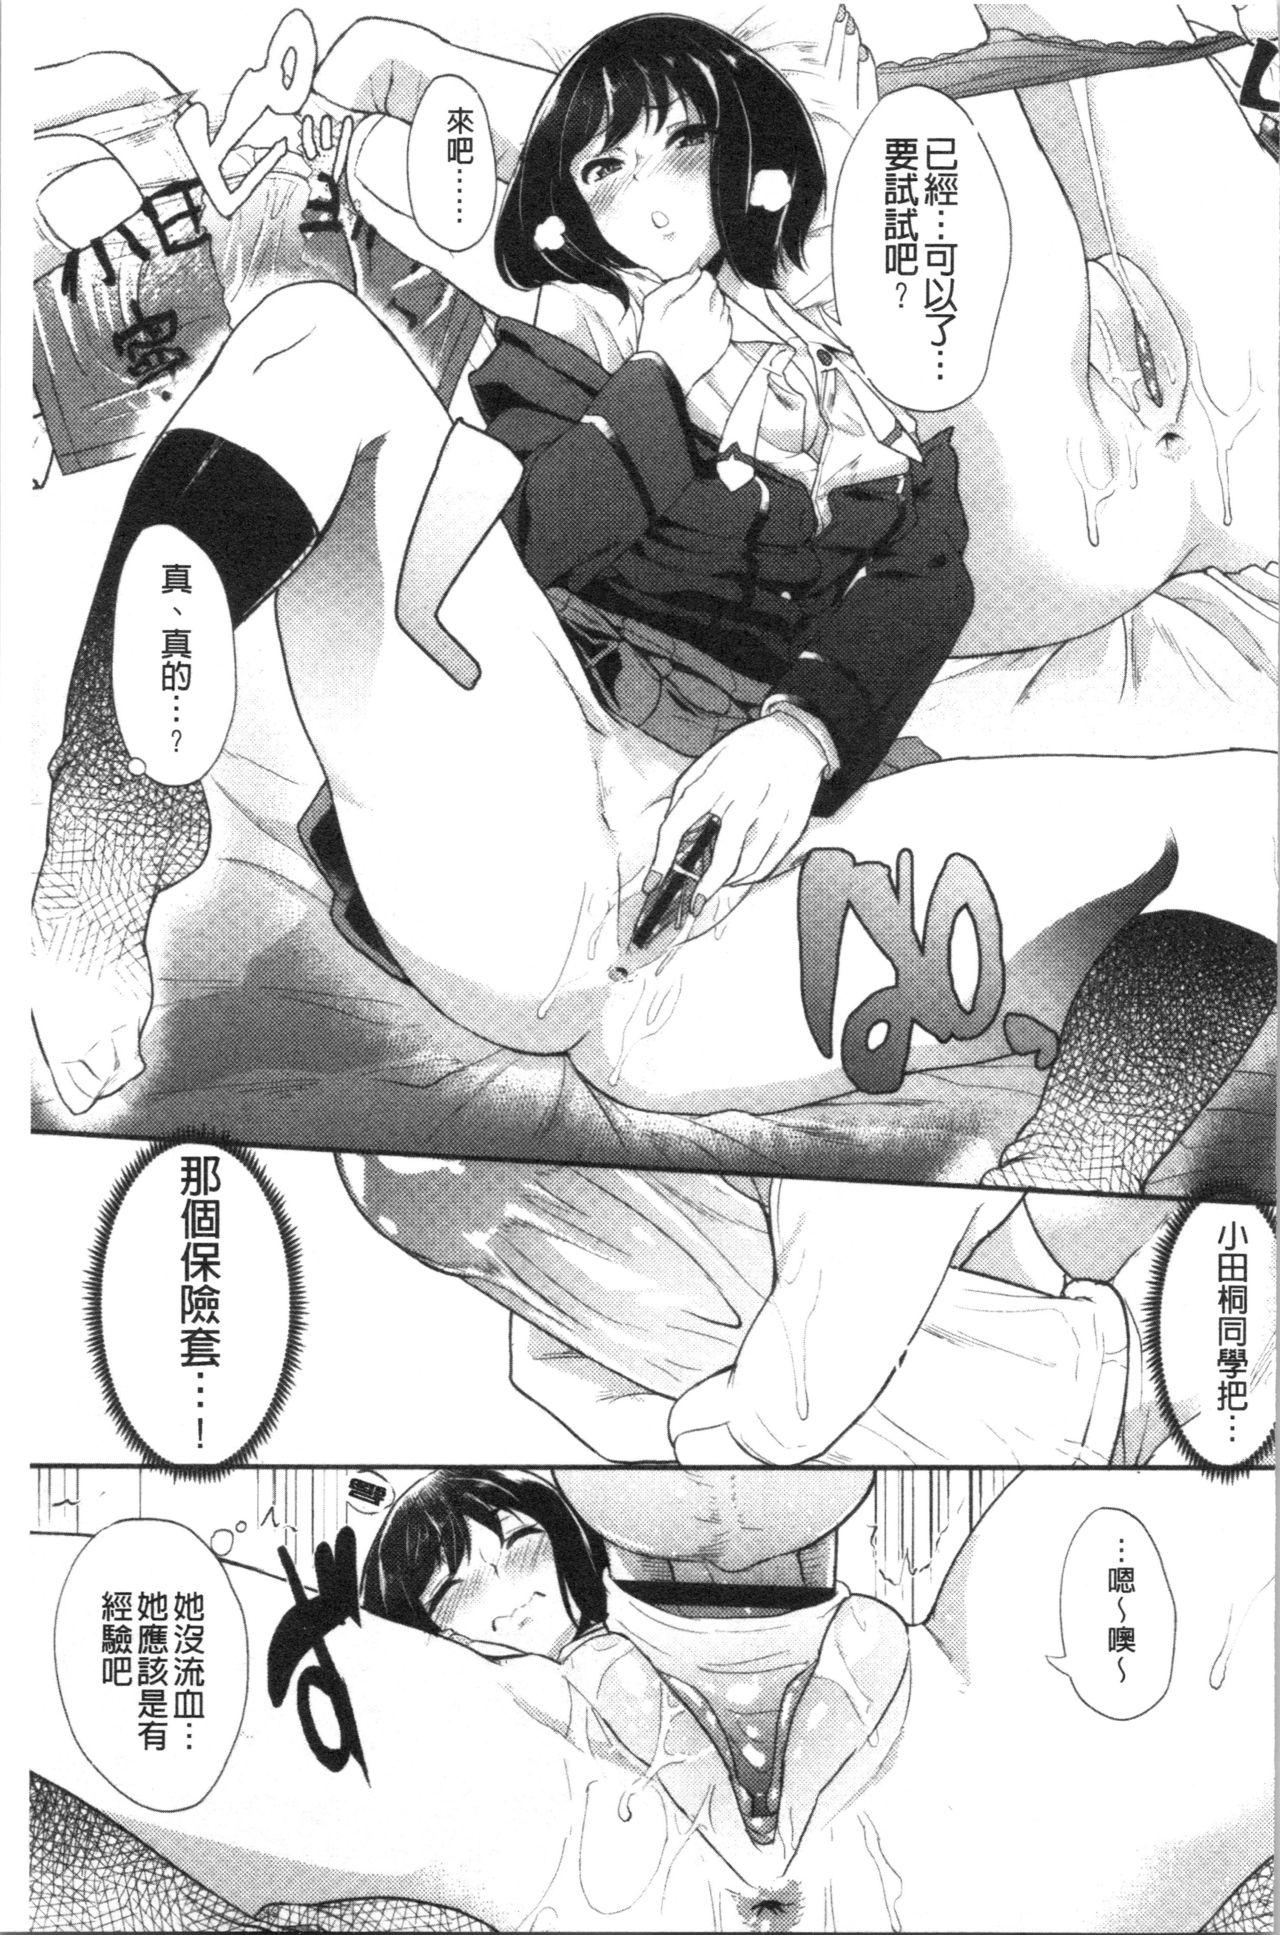 Kanojo ga SEX ni nare teru wake | 女友對激情性愛變很習慣的理由 123